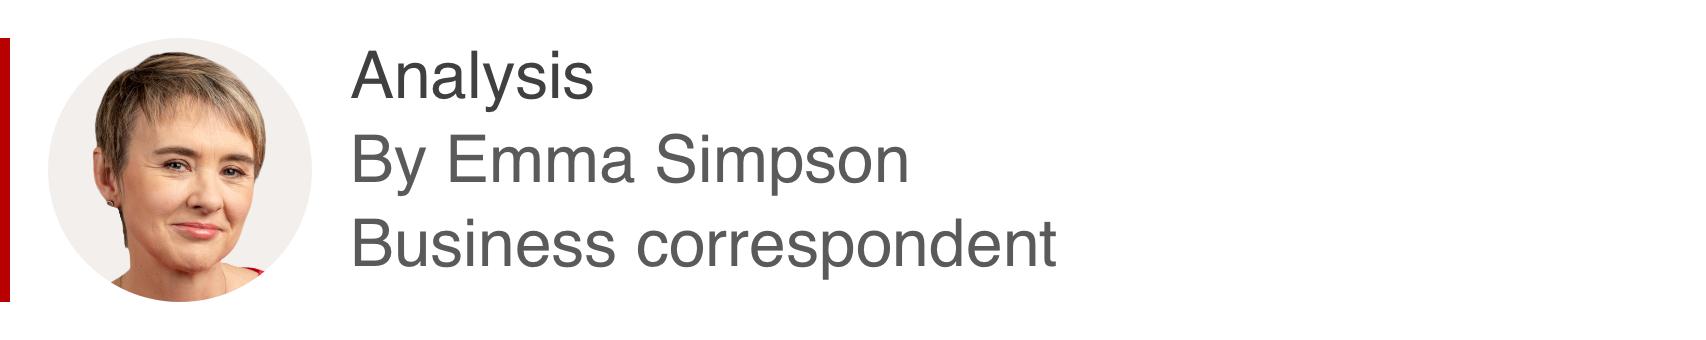 Analysis box by Emma Simpson, business correspondent